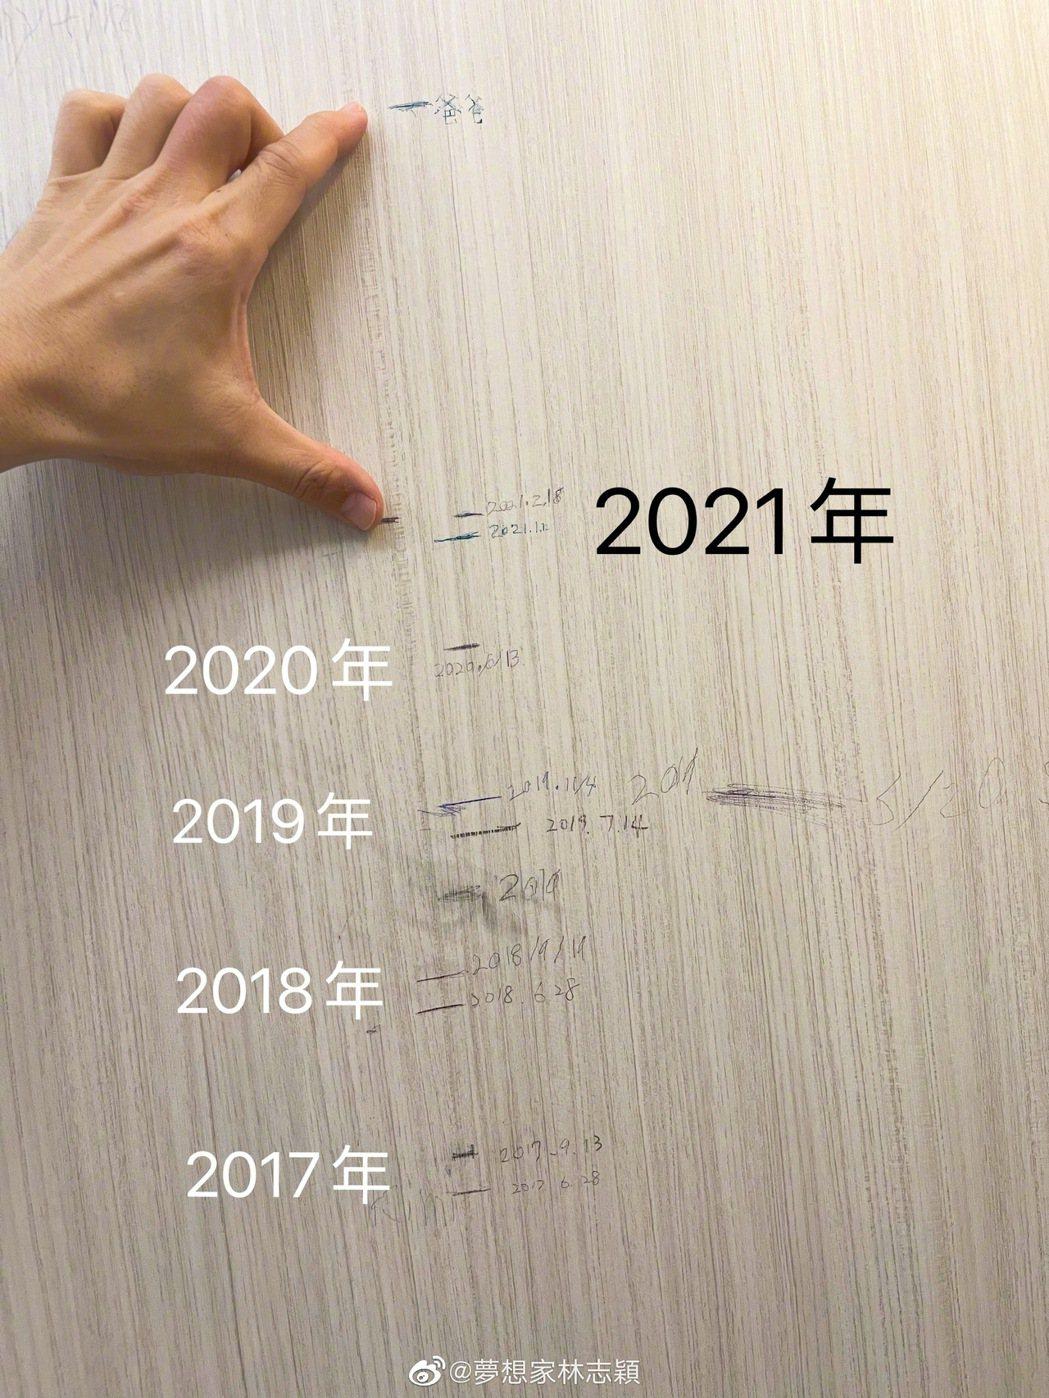 Kimi又長高了。圖/擷自微博